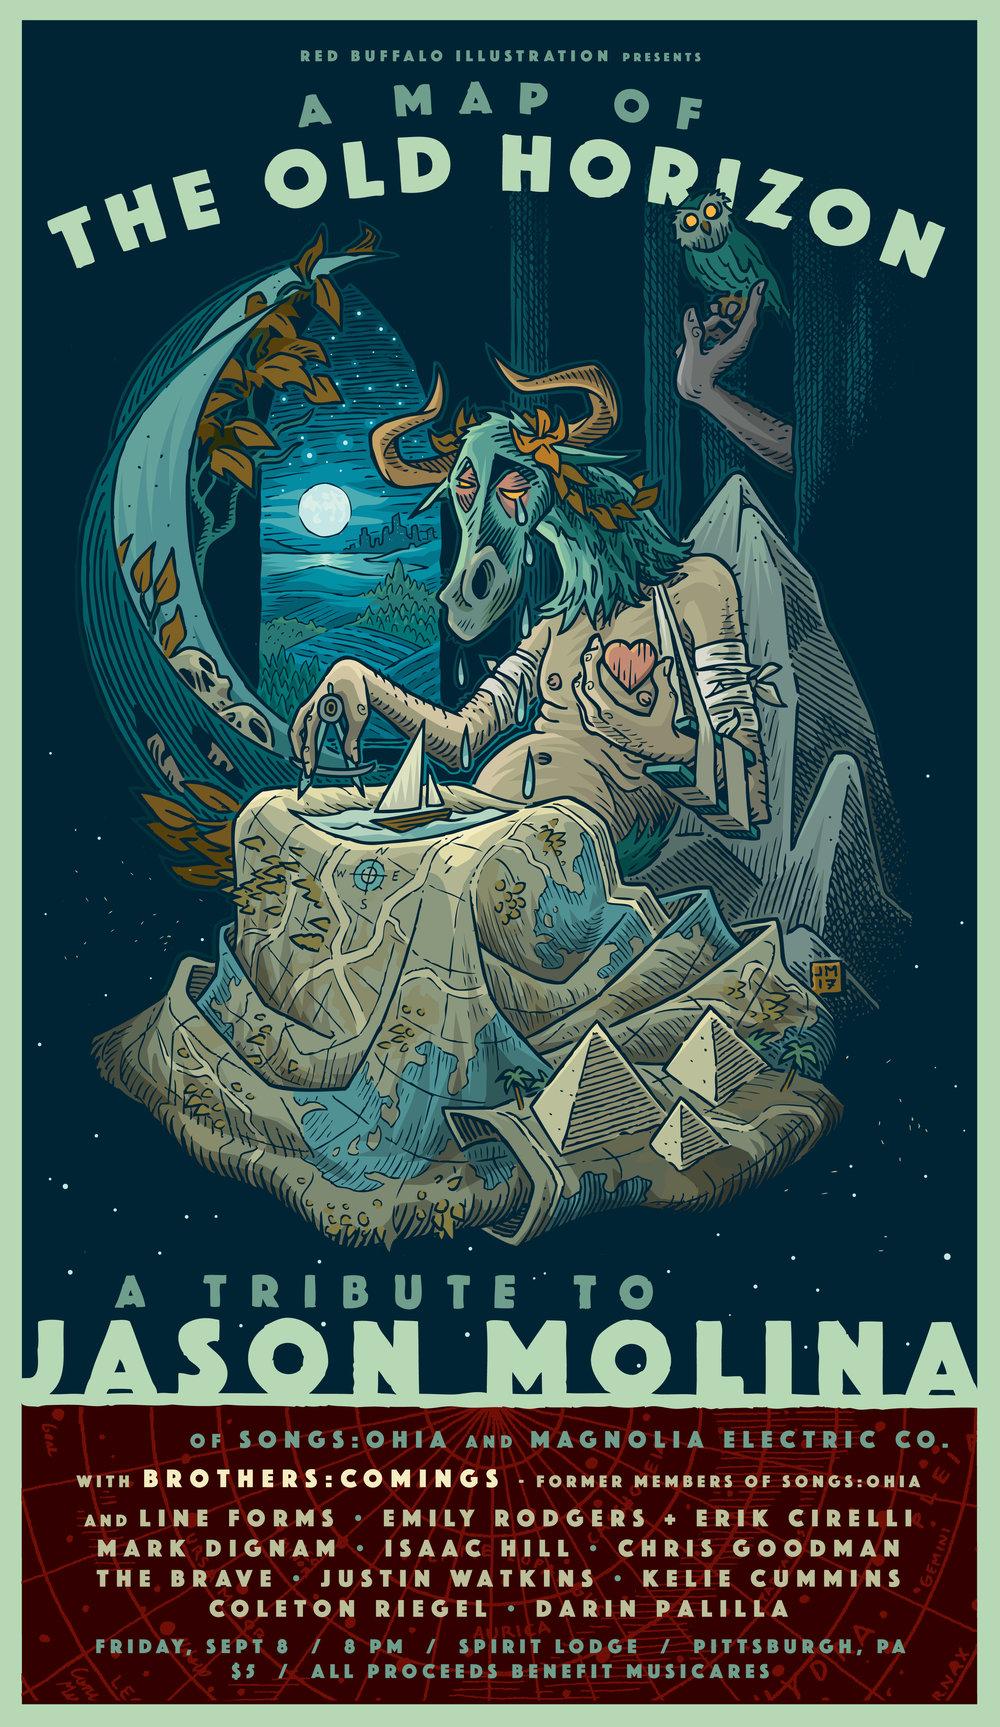 Jason Molina Tribute Show w:bandlist.jpg